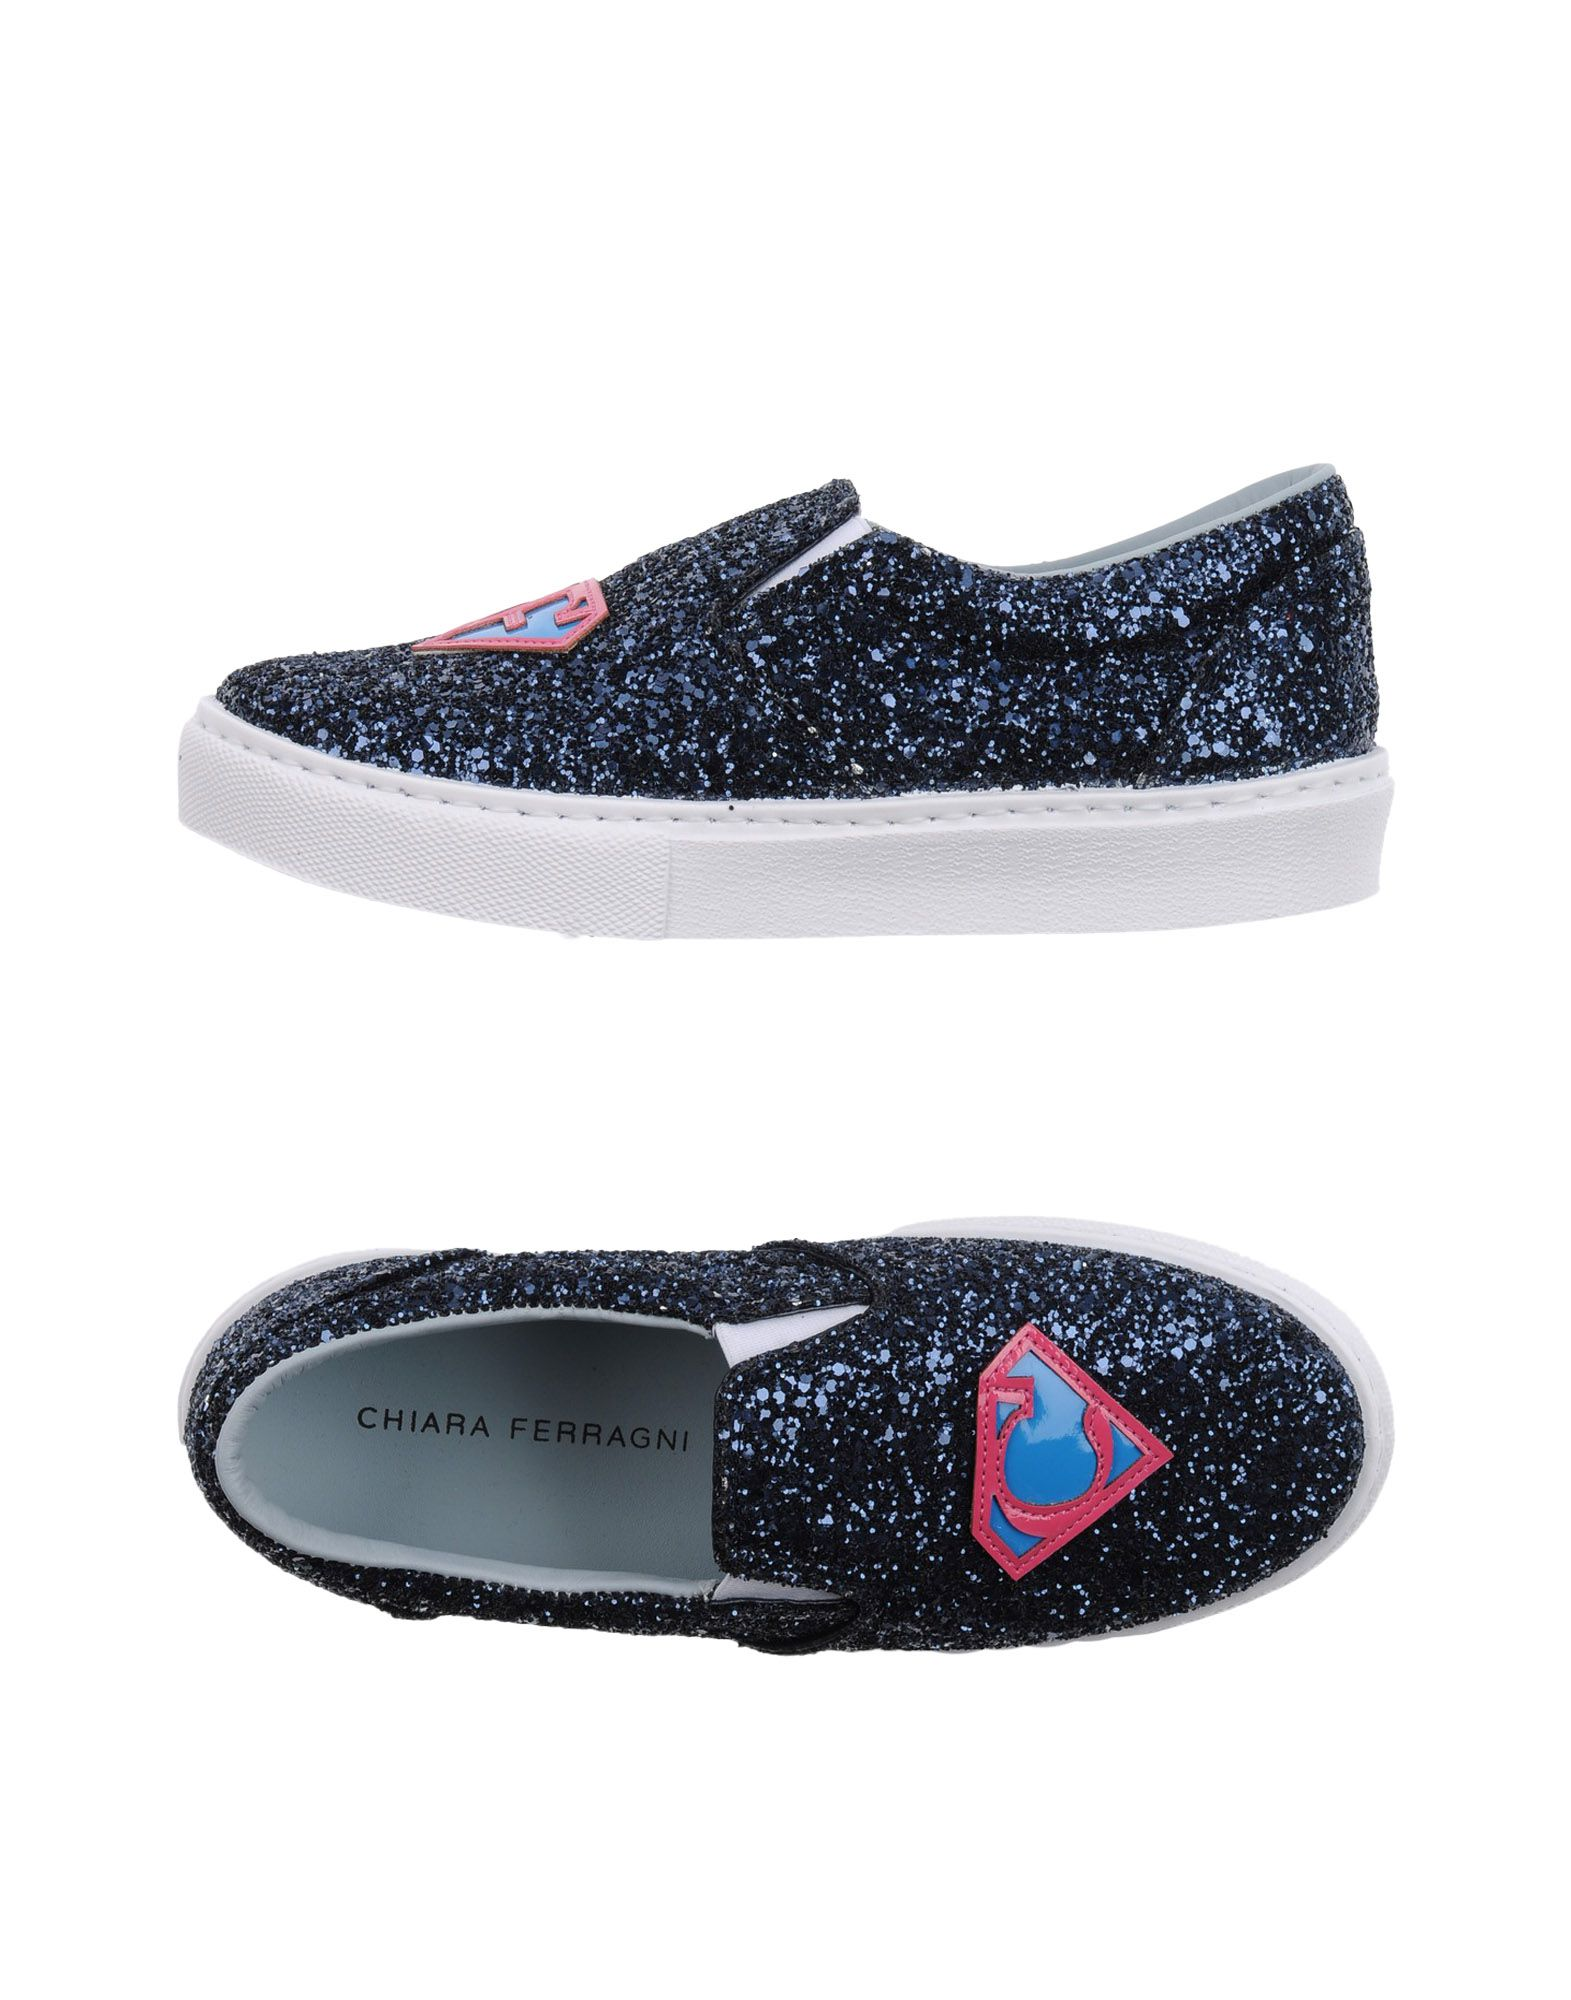 Stilvolle billige Schuhe Chiara Ferragni Sneakers Damen  11131352TE